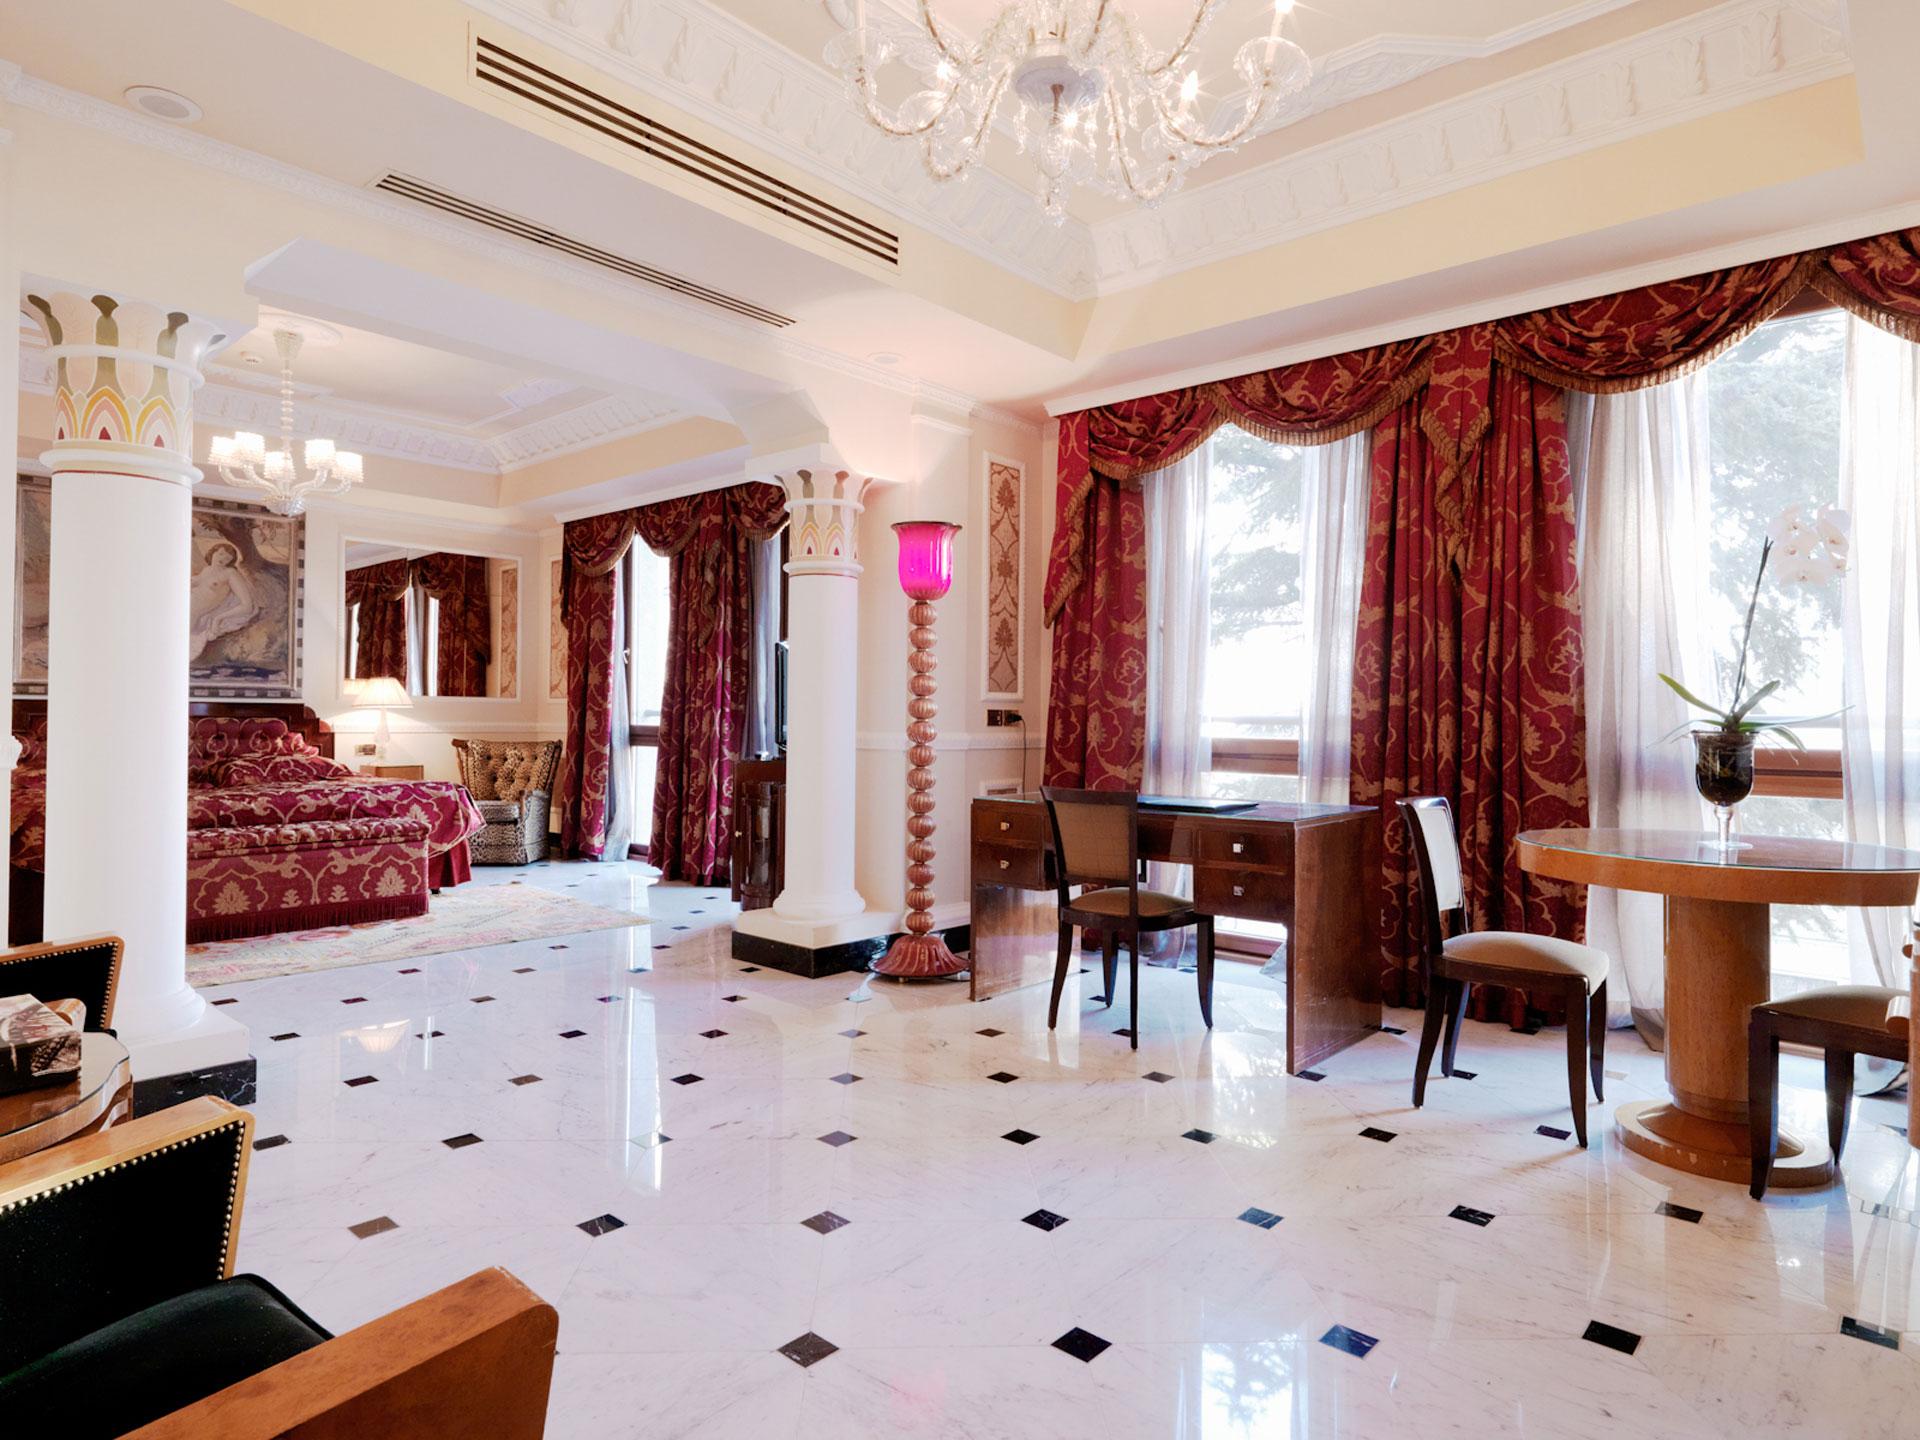 carlton hotel milano 1